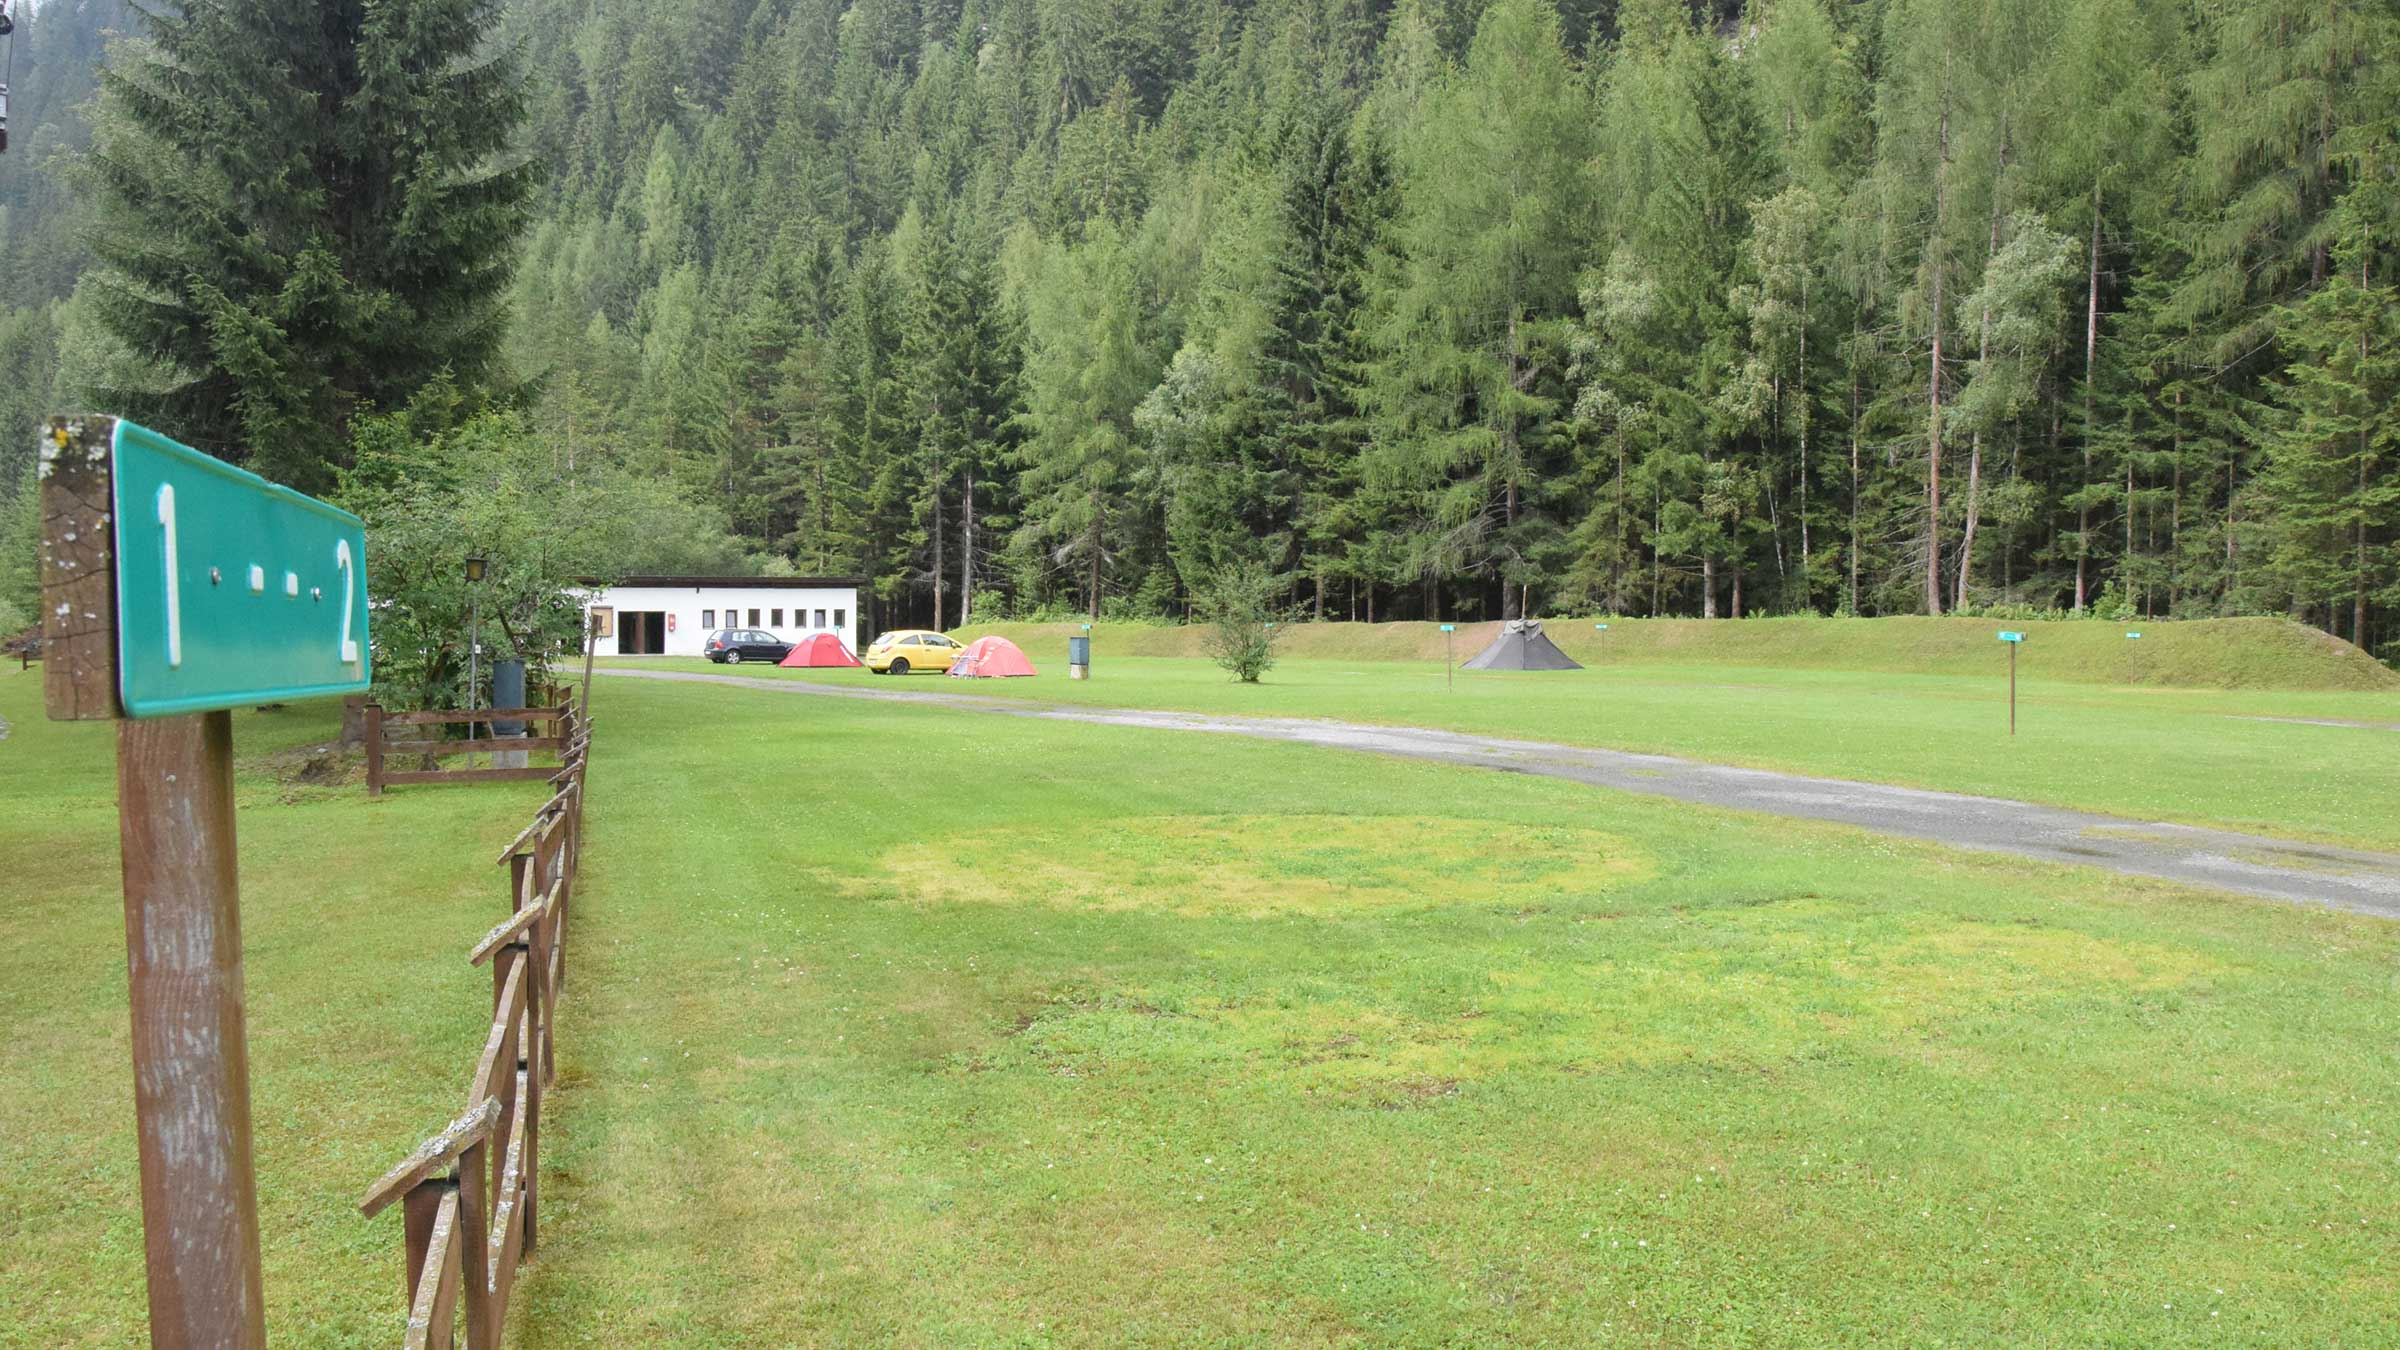 Campingplatz Winkle - Camping im Ötztal